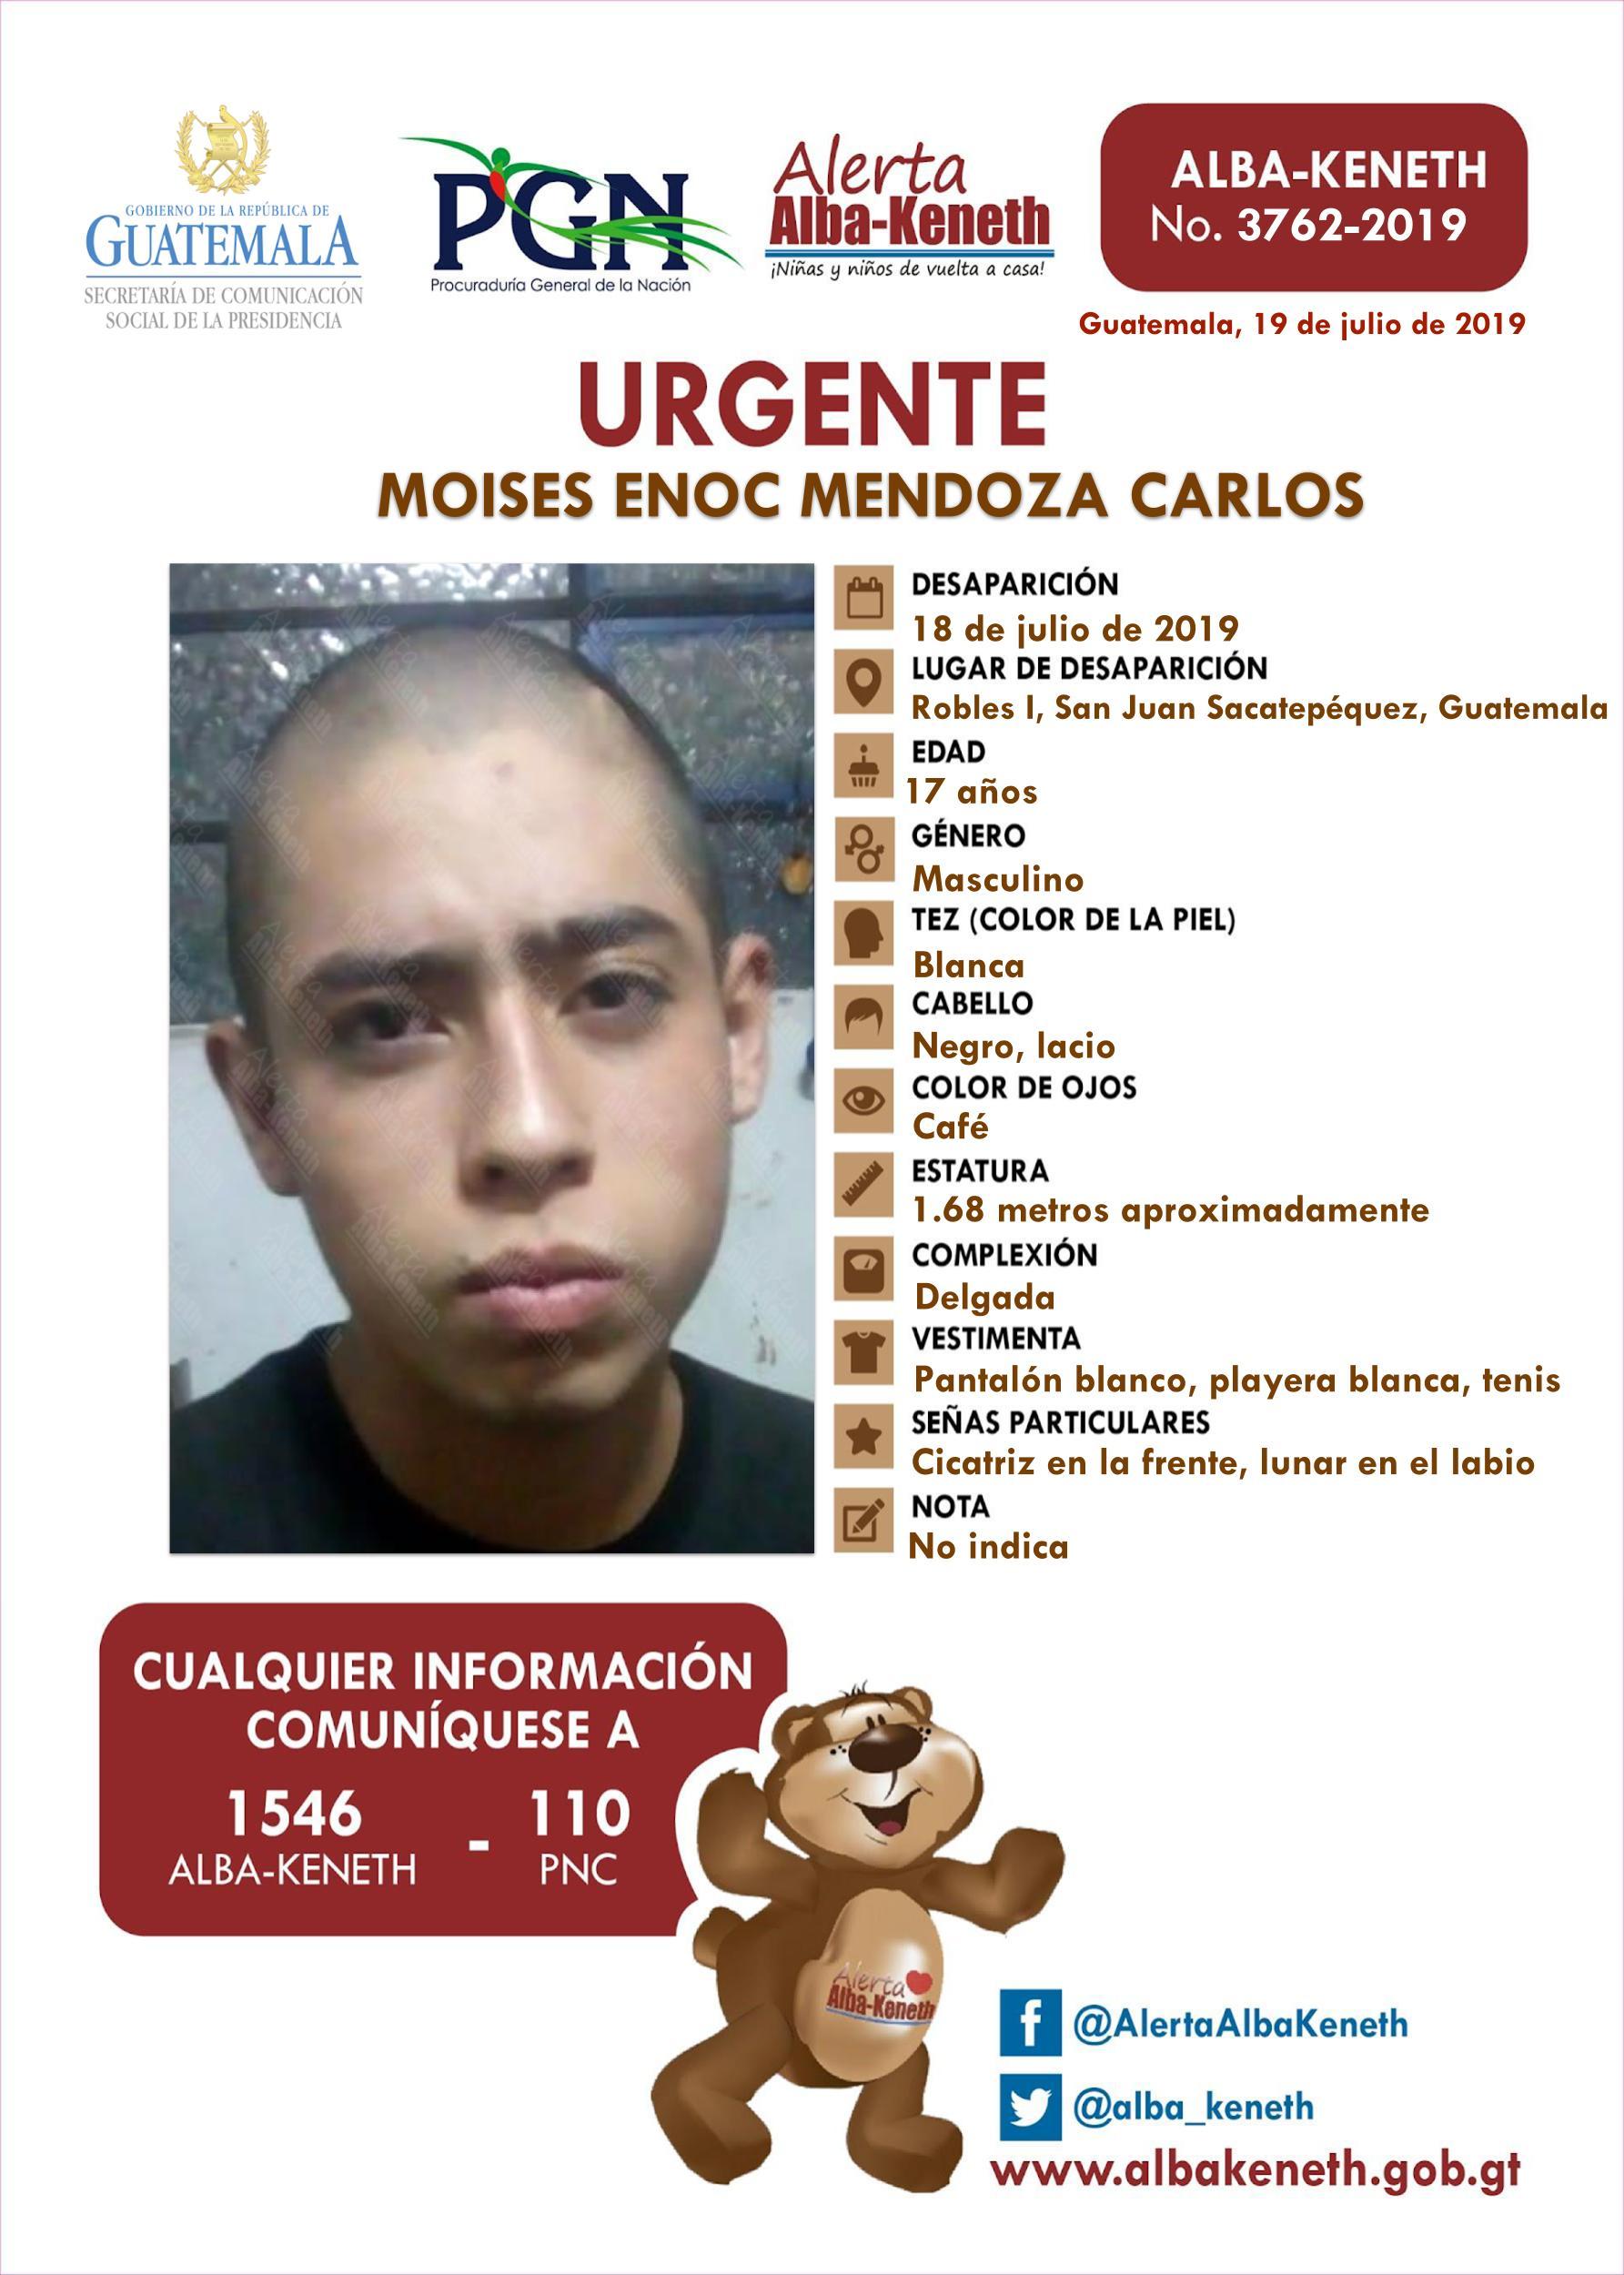 Moises Enoc Mendoza Carlos